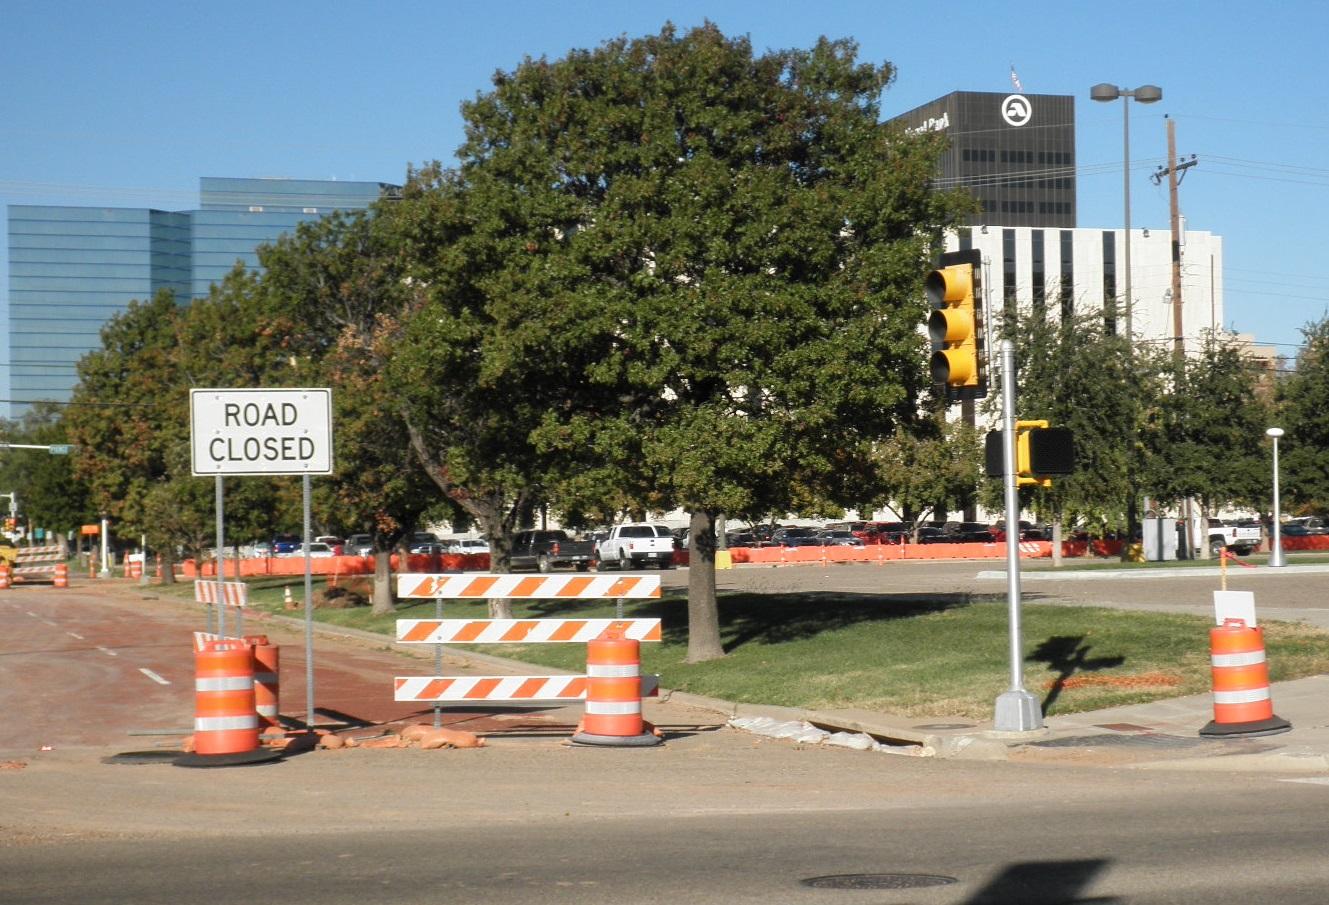 Traffic | City of Amarillo, TX